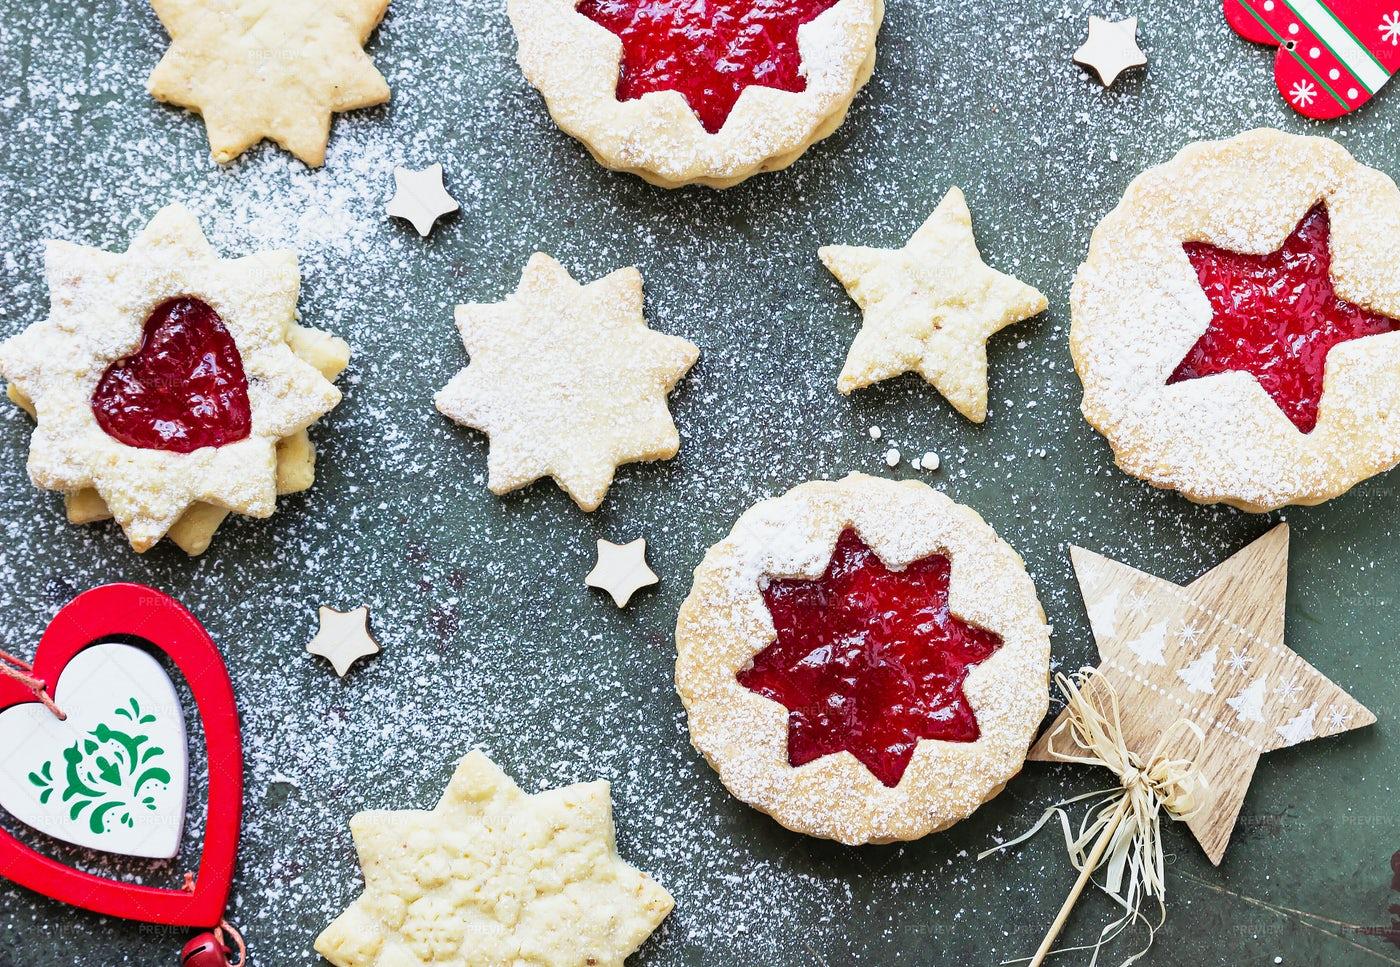 Linzer Cookies With Jam: Stock Photos